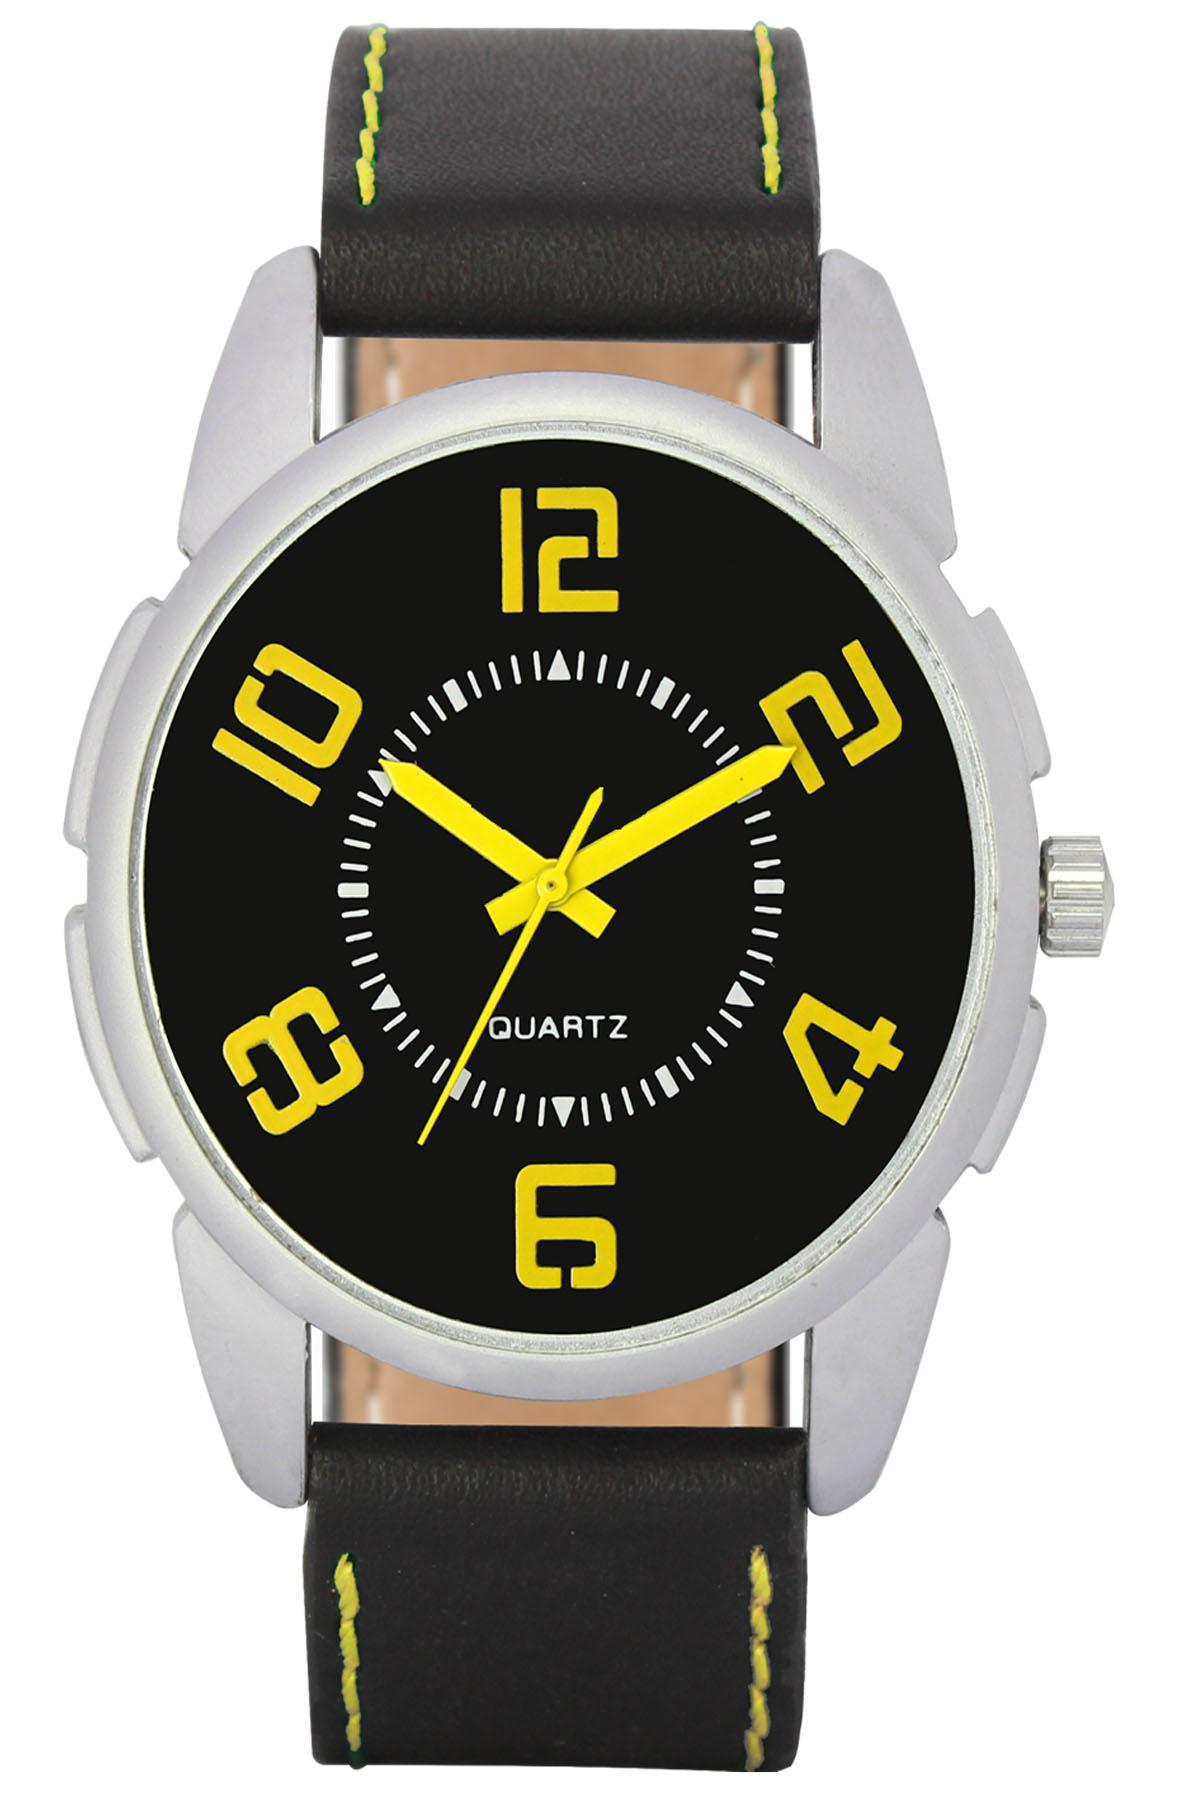 parienterprise Mens Watch Premium 40mm Black Round Dial Black Leather Strap And Yellow Storm Mens Analog Watch 121